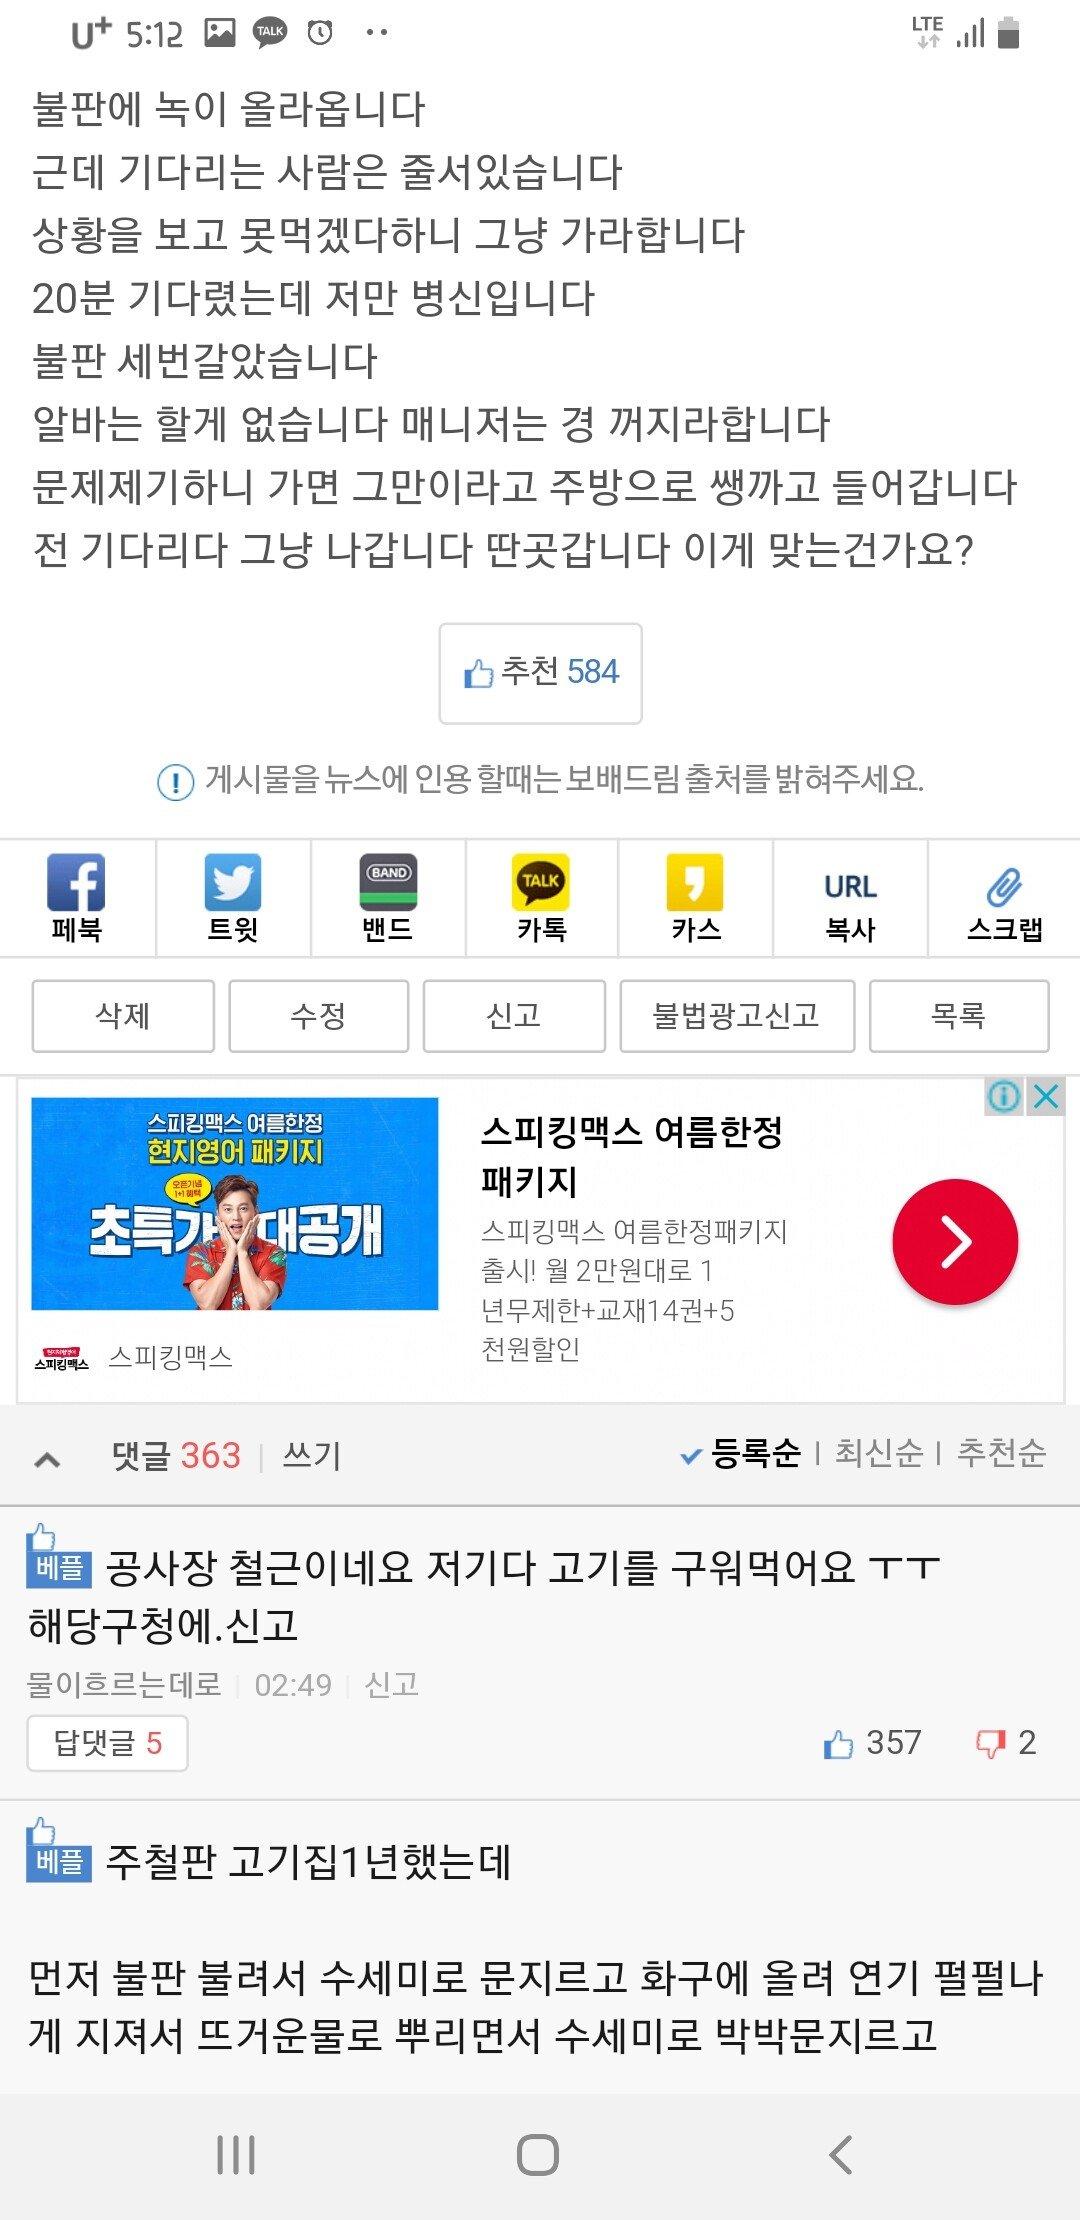 Screenshot_20190711-171208_Samsung Internet.jpg 보배펌) 송도 어느 껍데기집의 위생상태